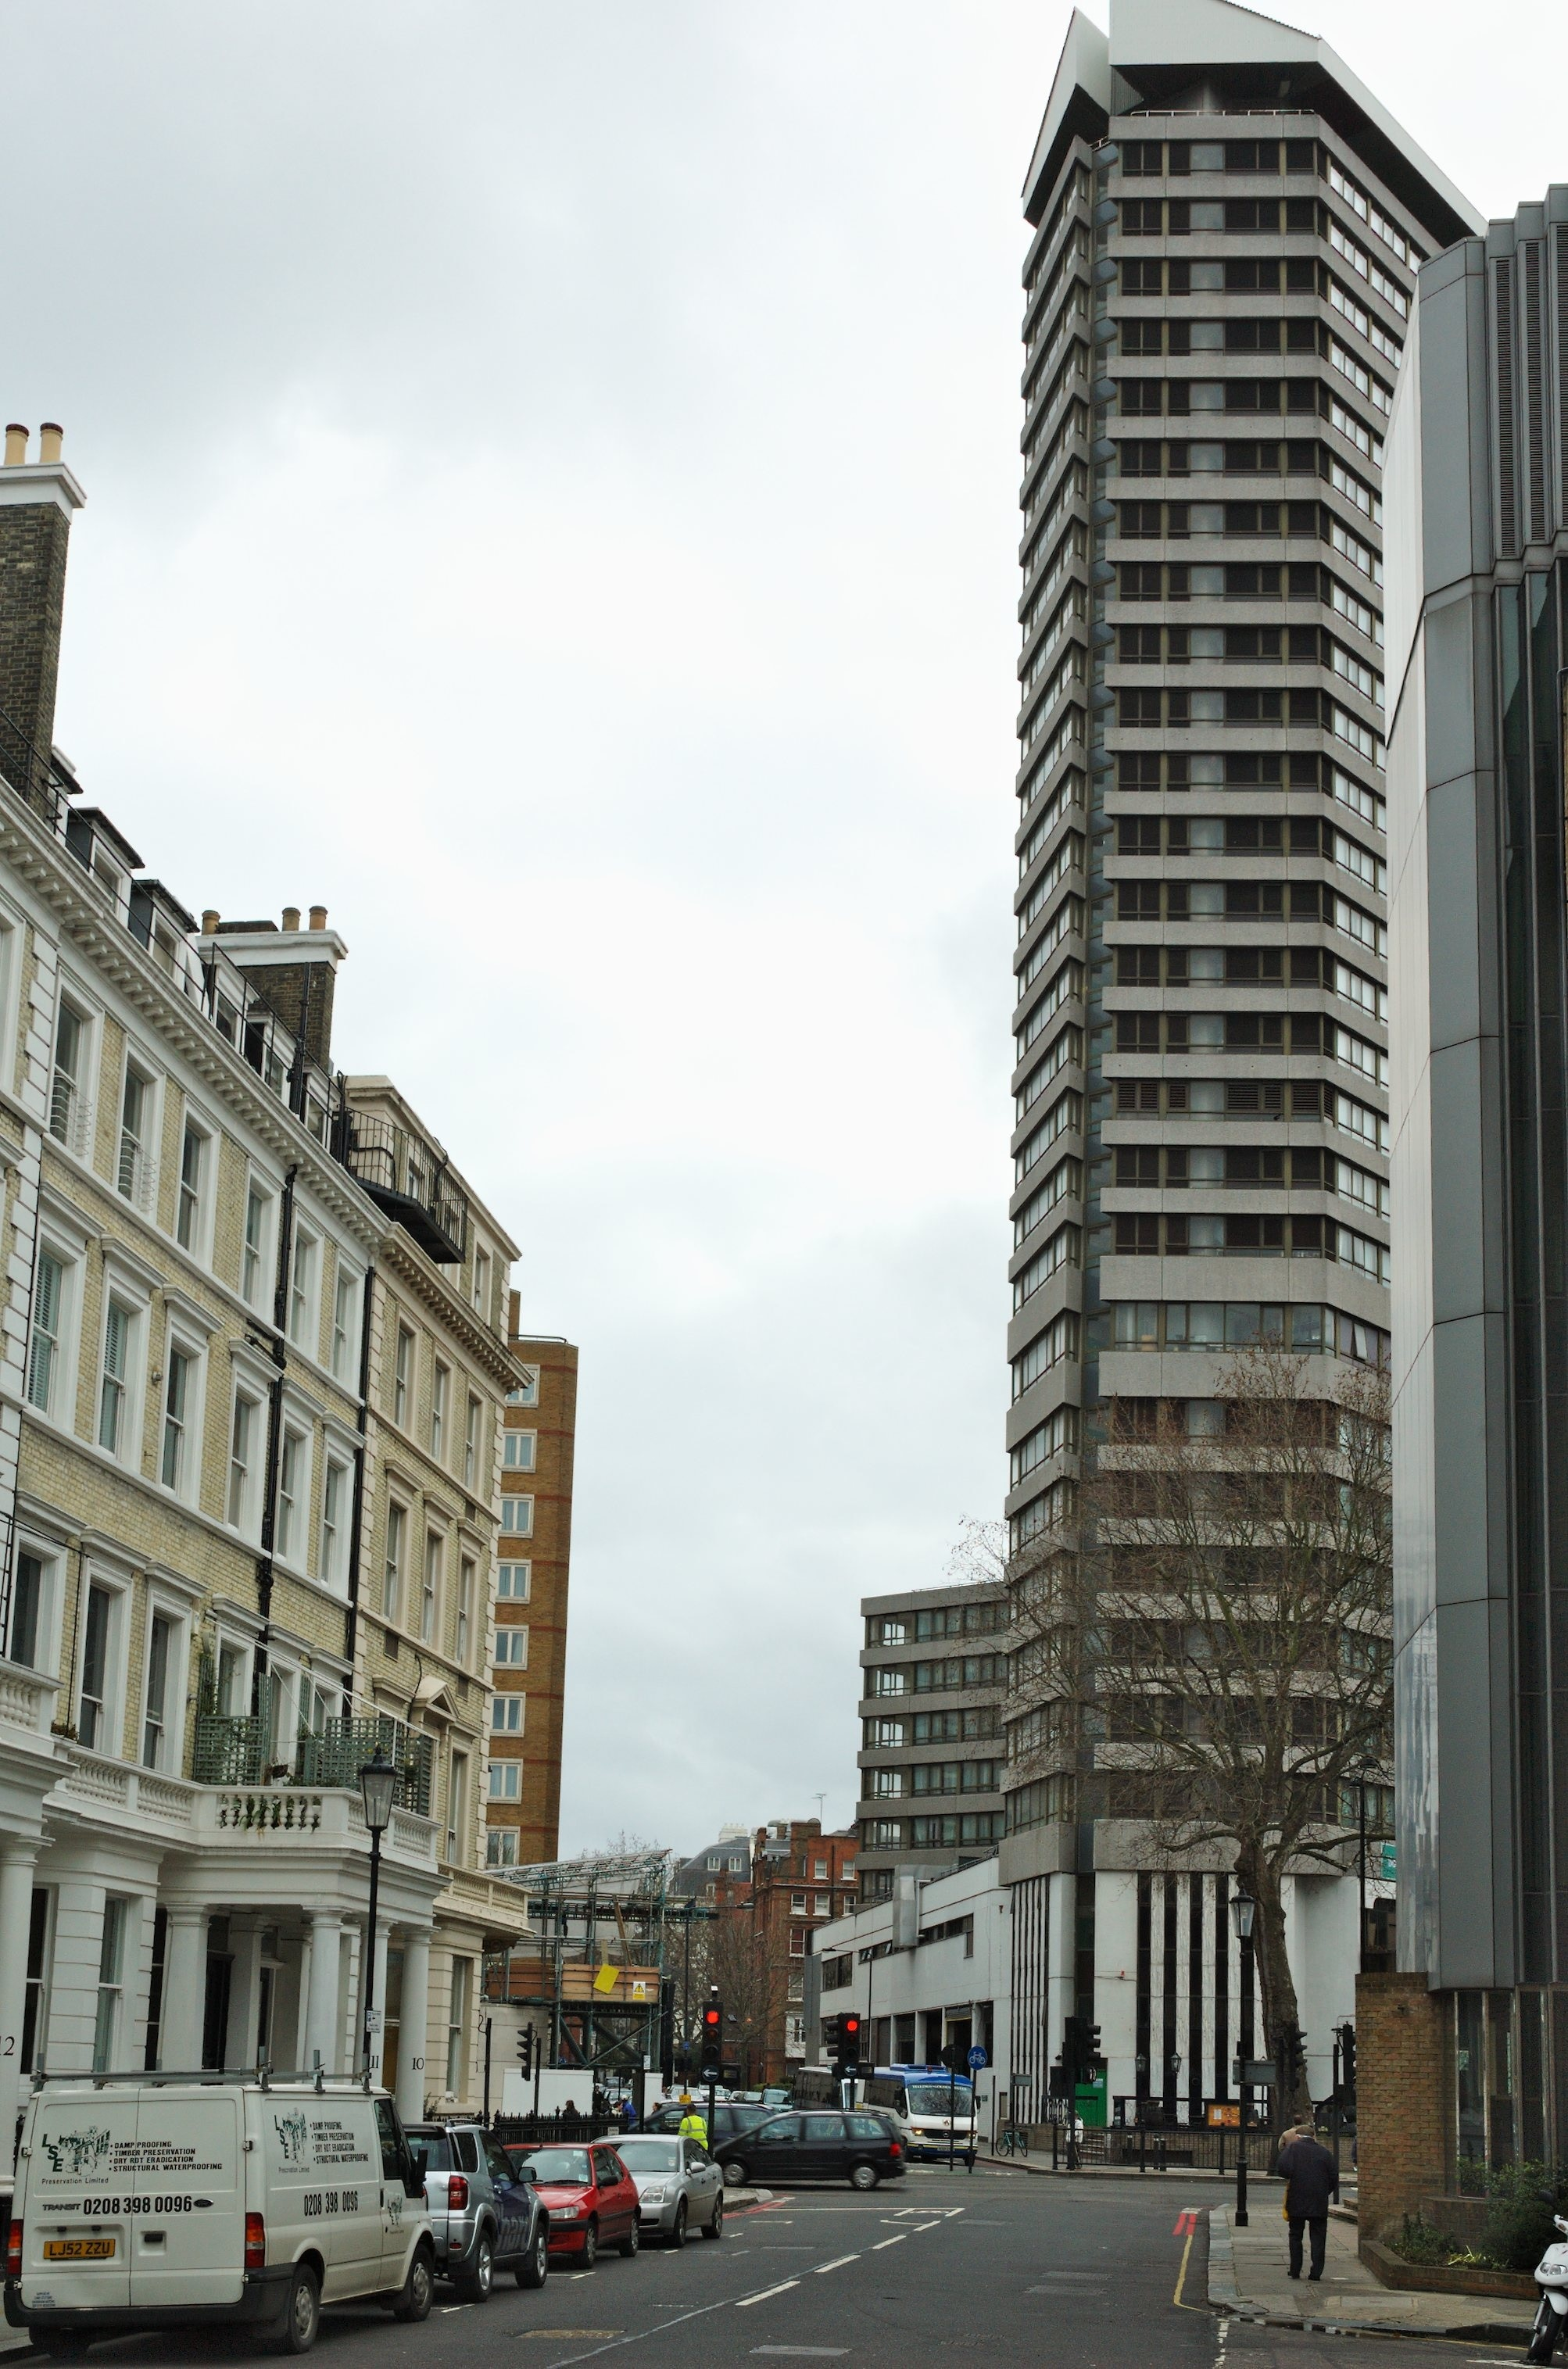 Earl's Court, London, England, United Kingdom